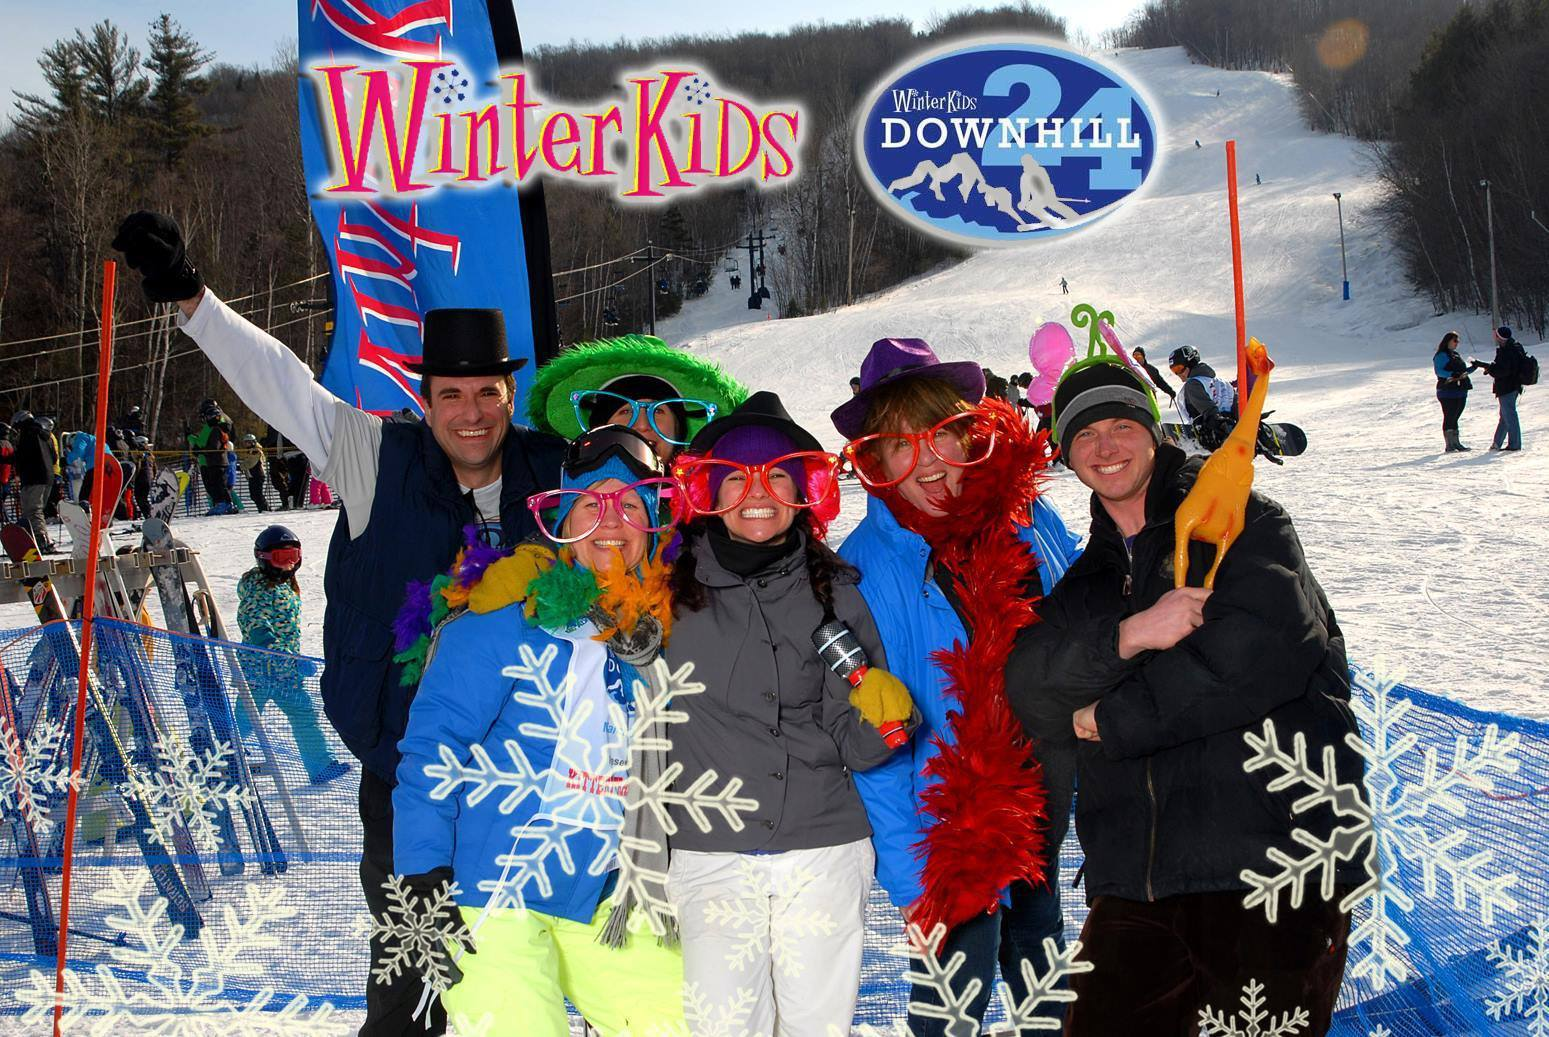 WinterKids Downhill24 2015 Photo Booth019